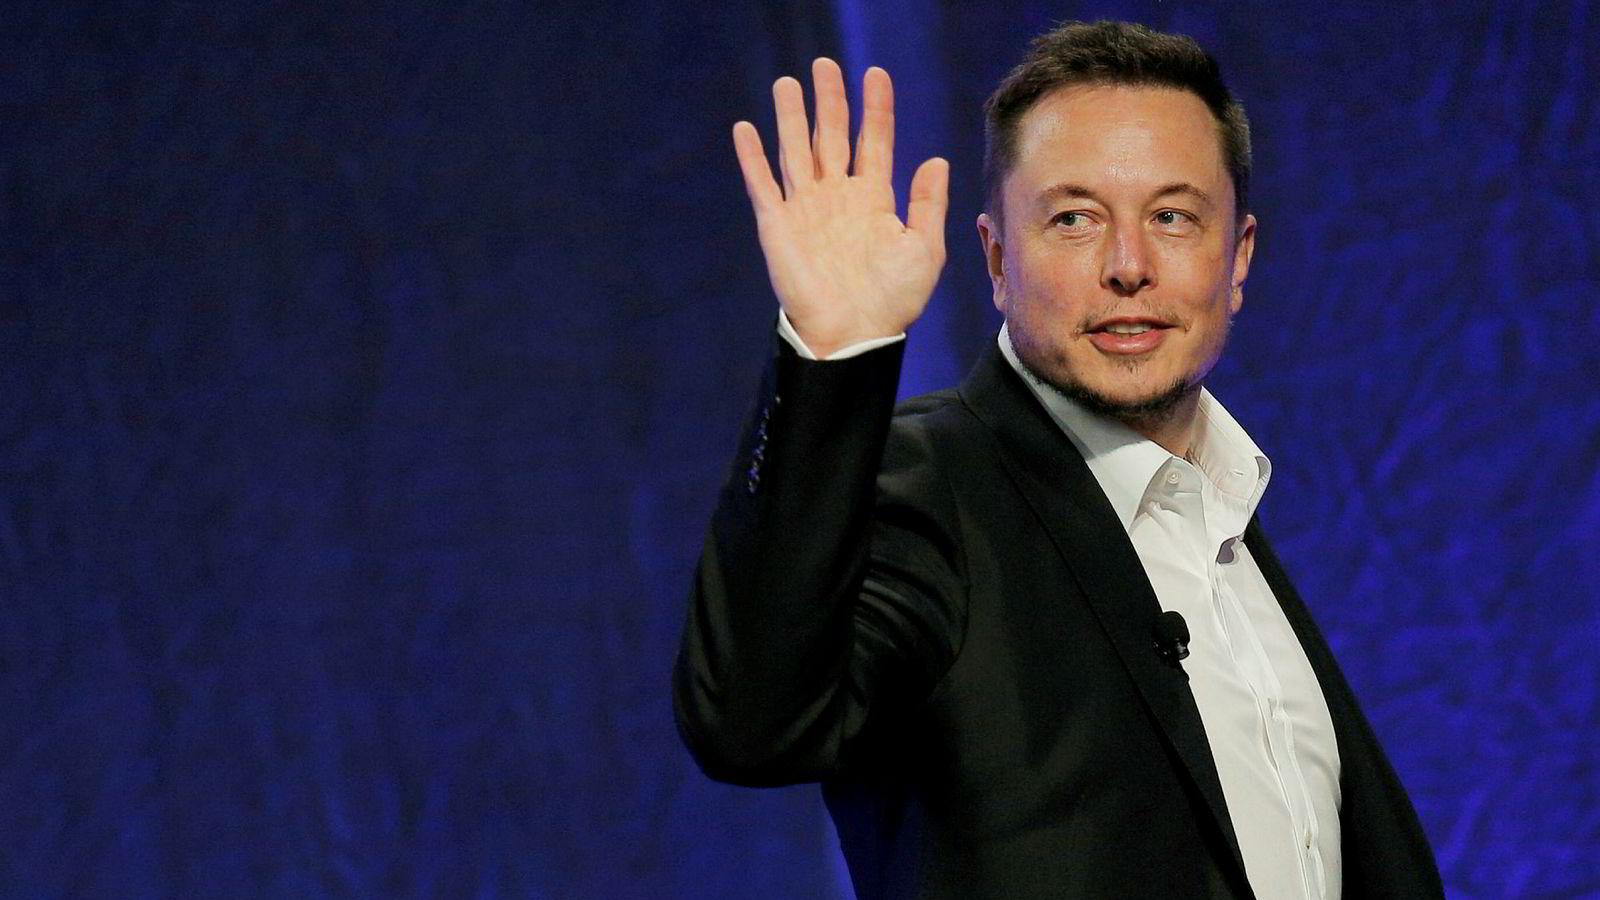 Onsdag kveld ble det klart at Tesla taper mer enn forventet. Foto: Brian Snyder / Reuters / NTB Scanpix